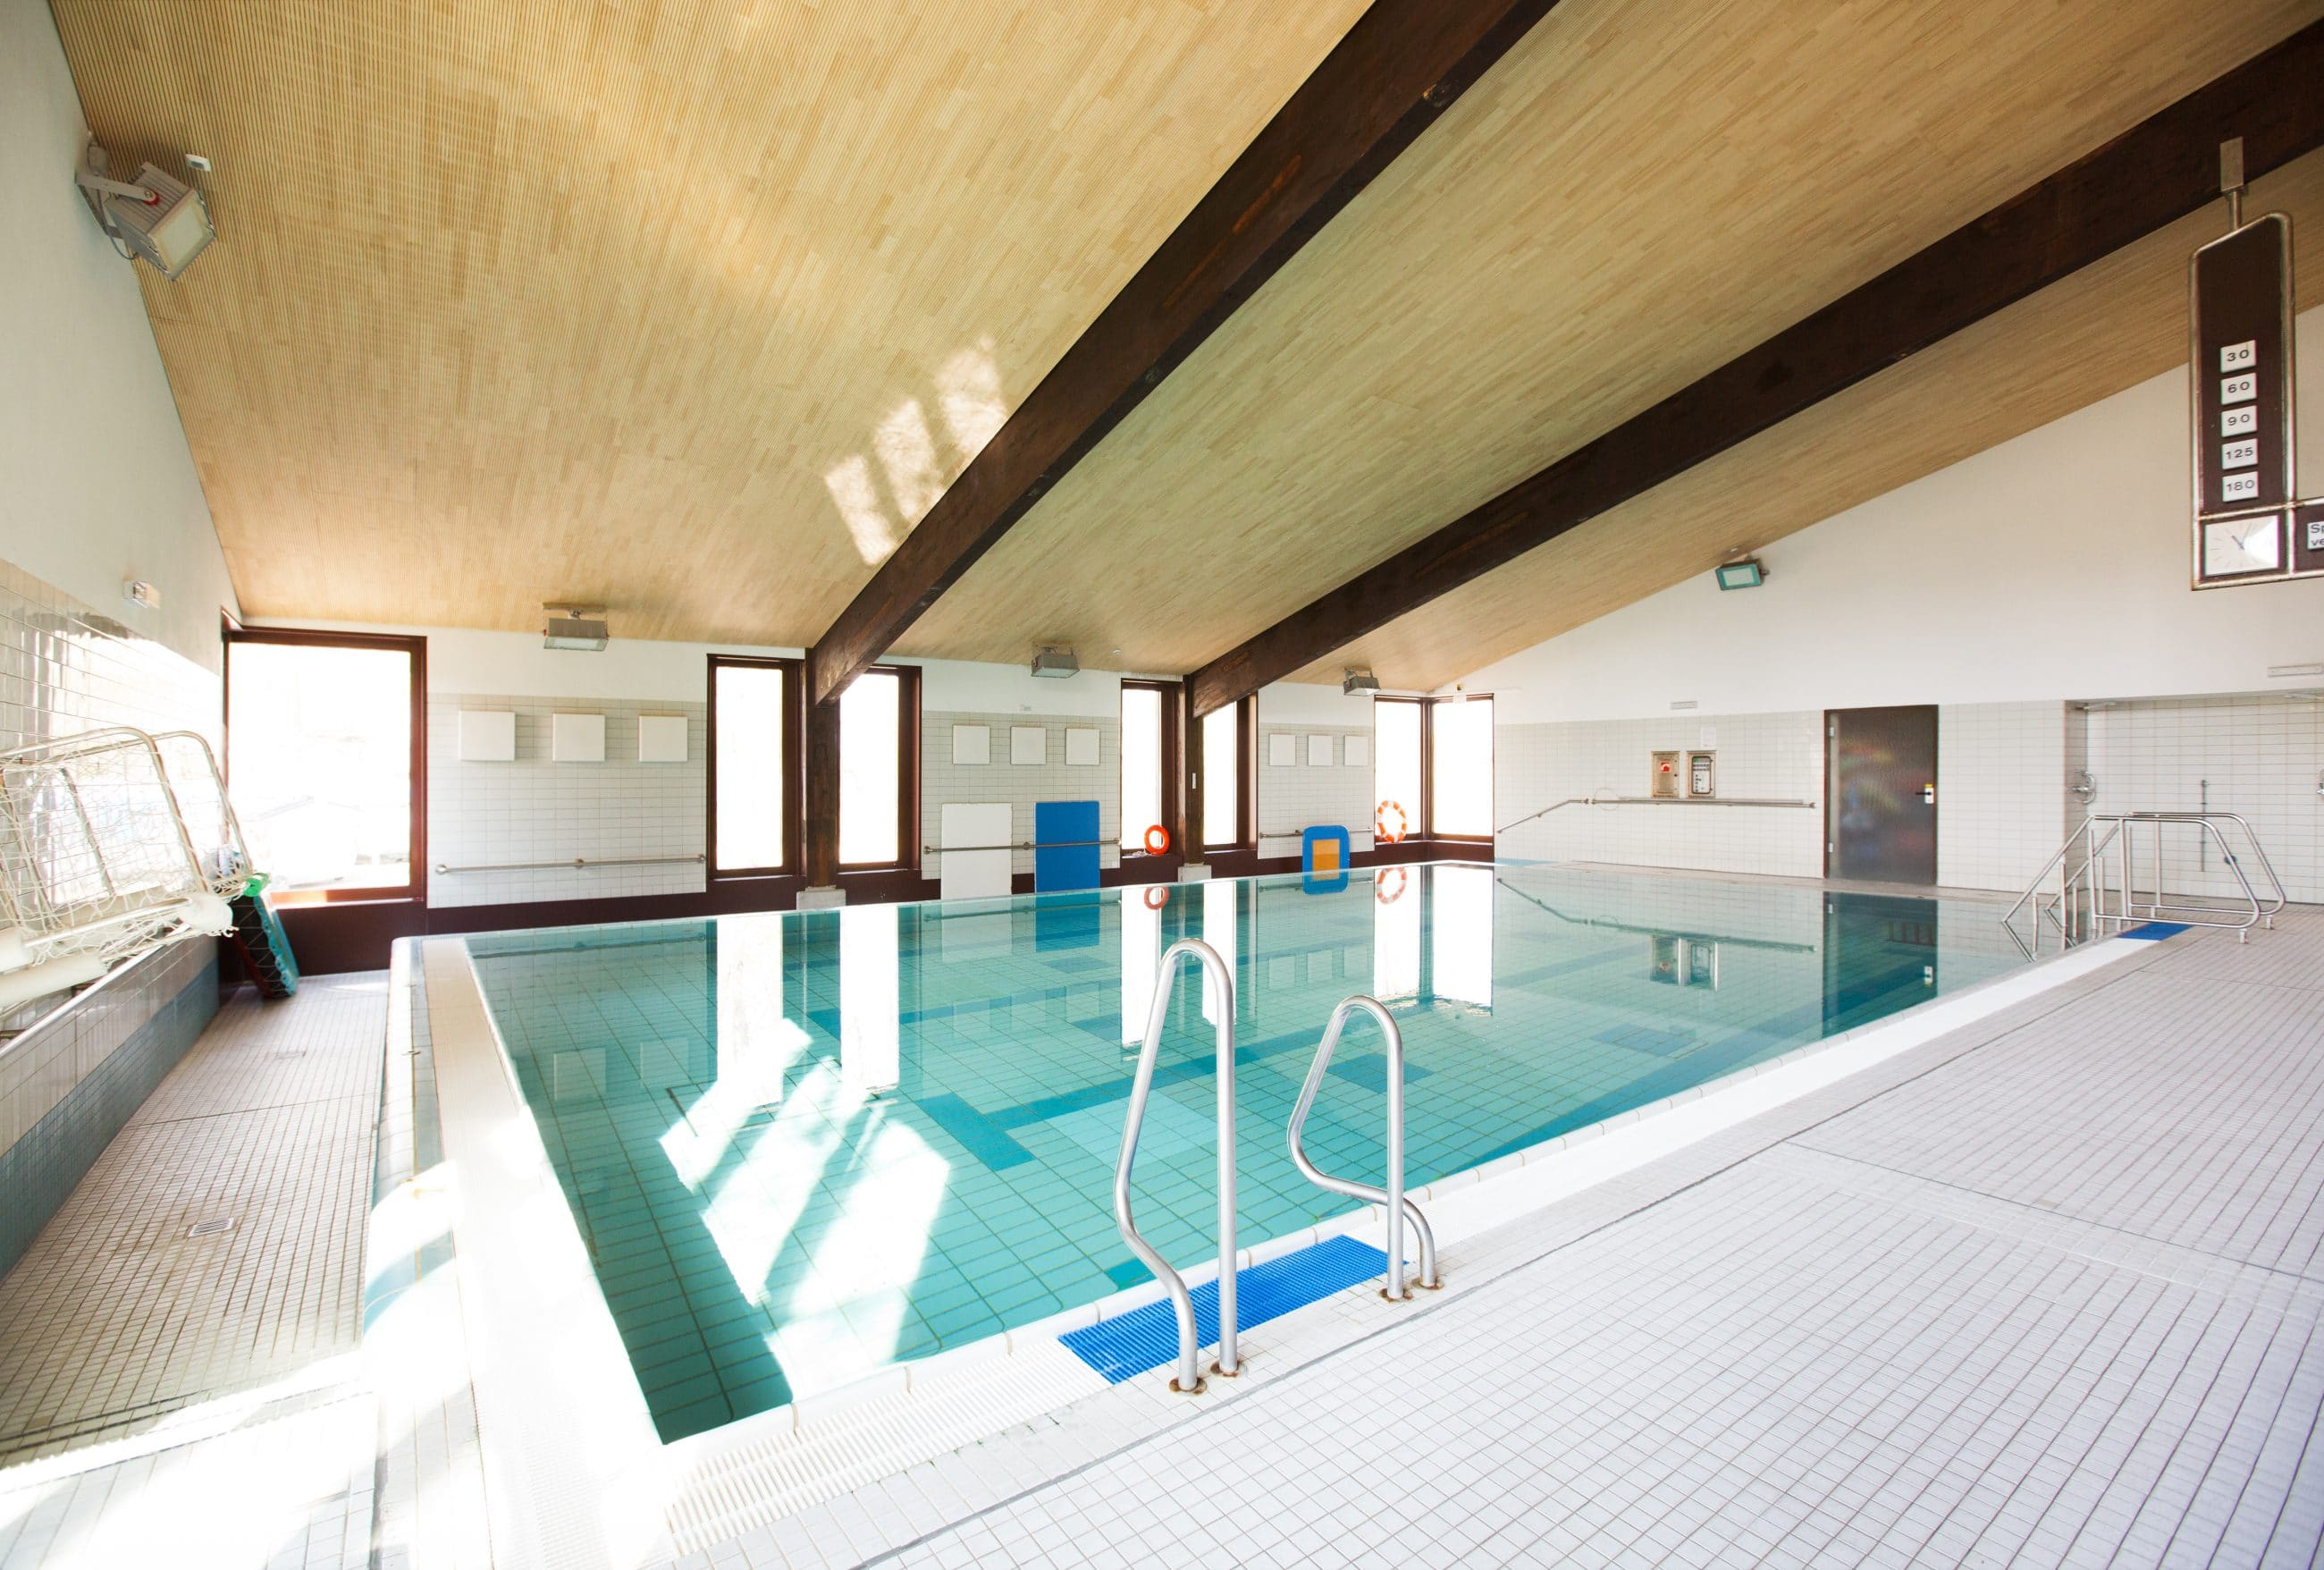 Eugen-Neter-Schule Schwimmbecken